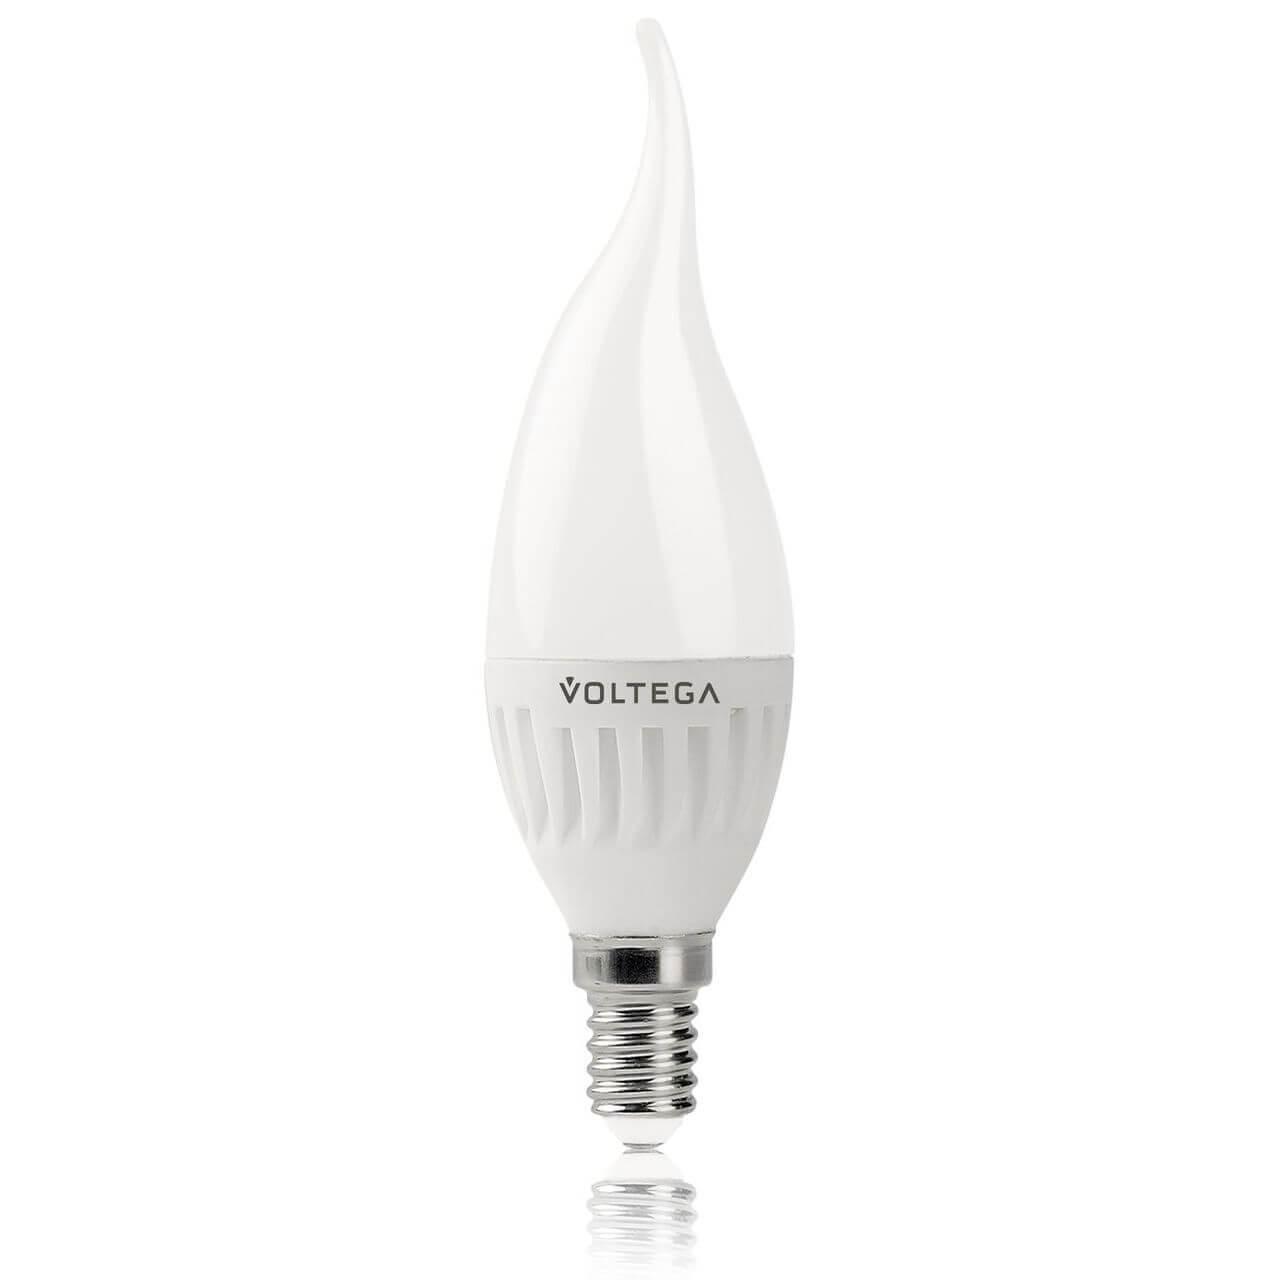 Лампа светодиодная Voltega E14 6.5W 4000К матовая VG1-CW2E14cold6W 5720 voltega лампа светодиодная voltega рефлектор матовый e14 5 4w 4000к vg4 rm2e14cold5w 5756